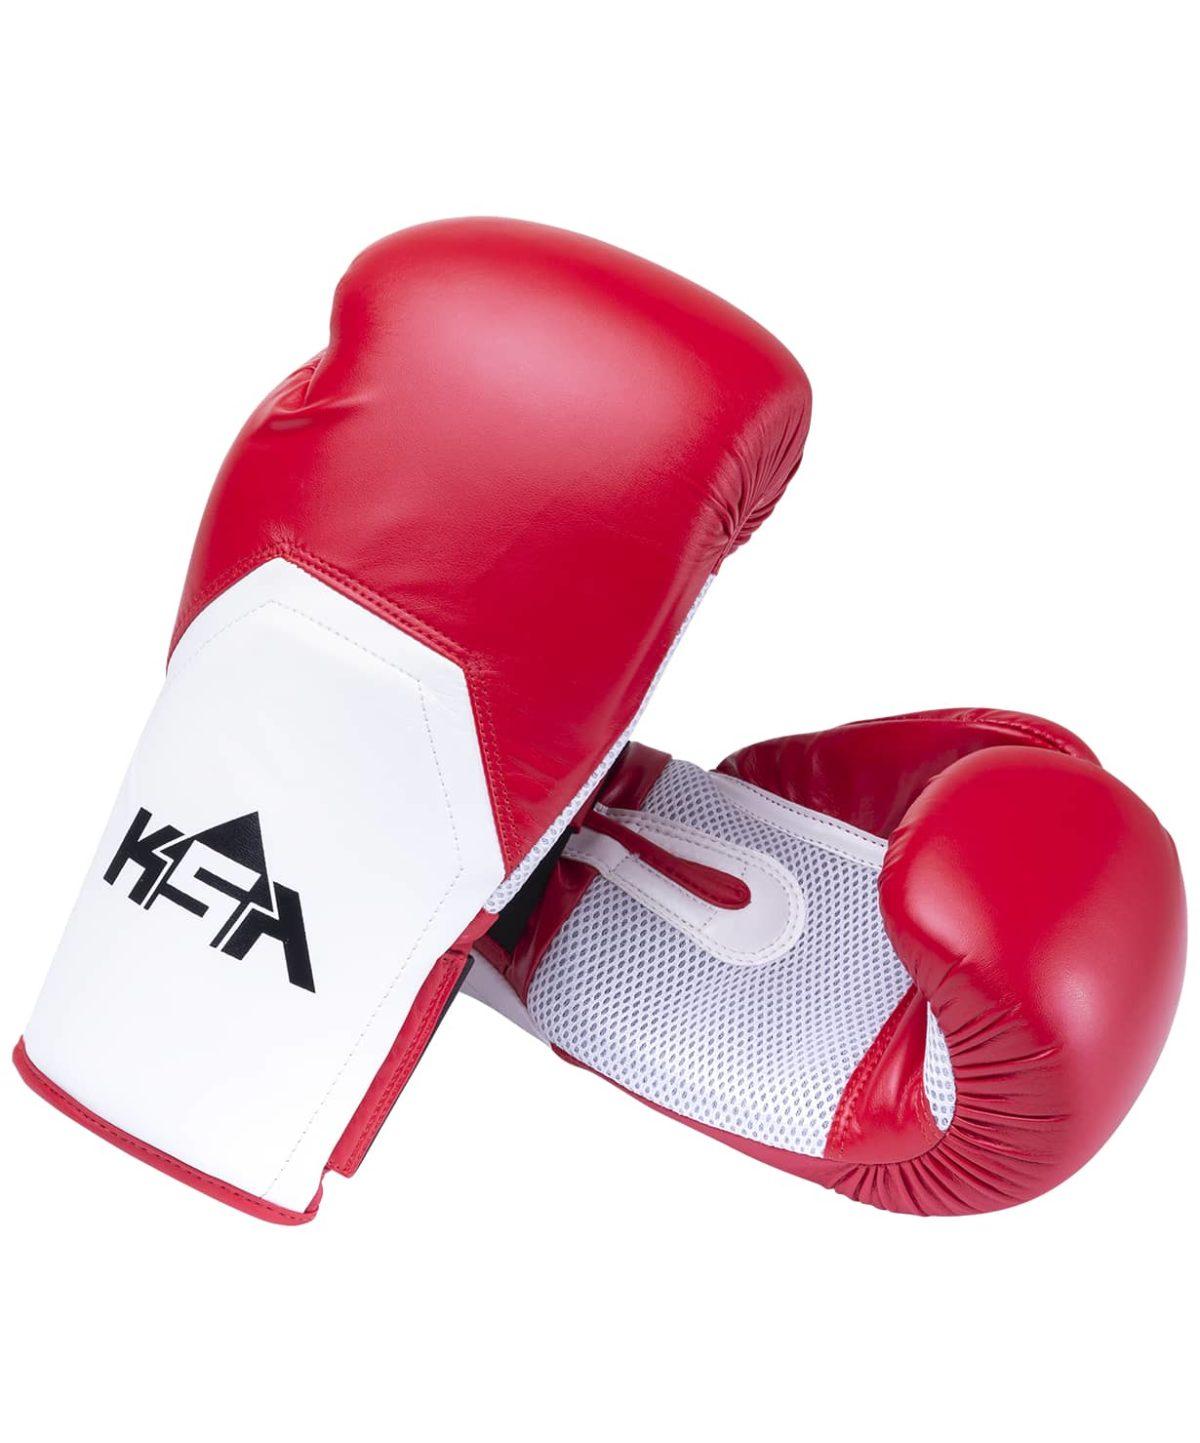 KSA Scorpio Red Перчатки боксерские, 10 oz, к/з  17824 - 1